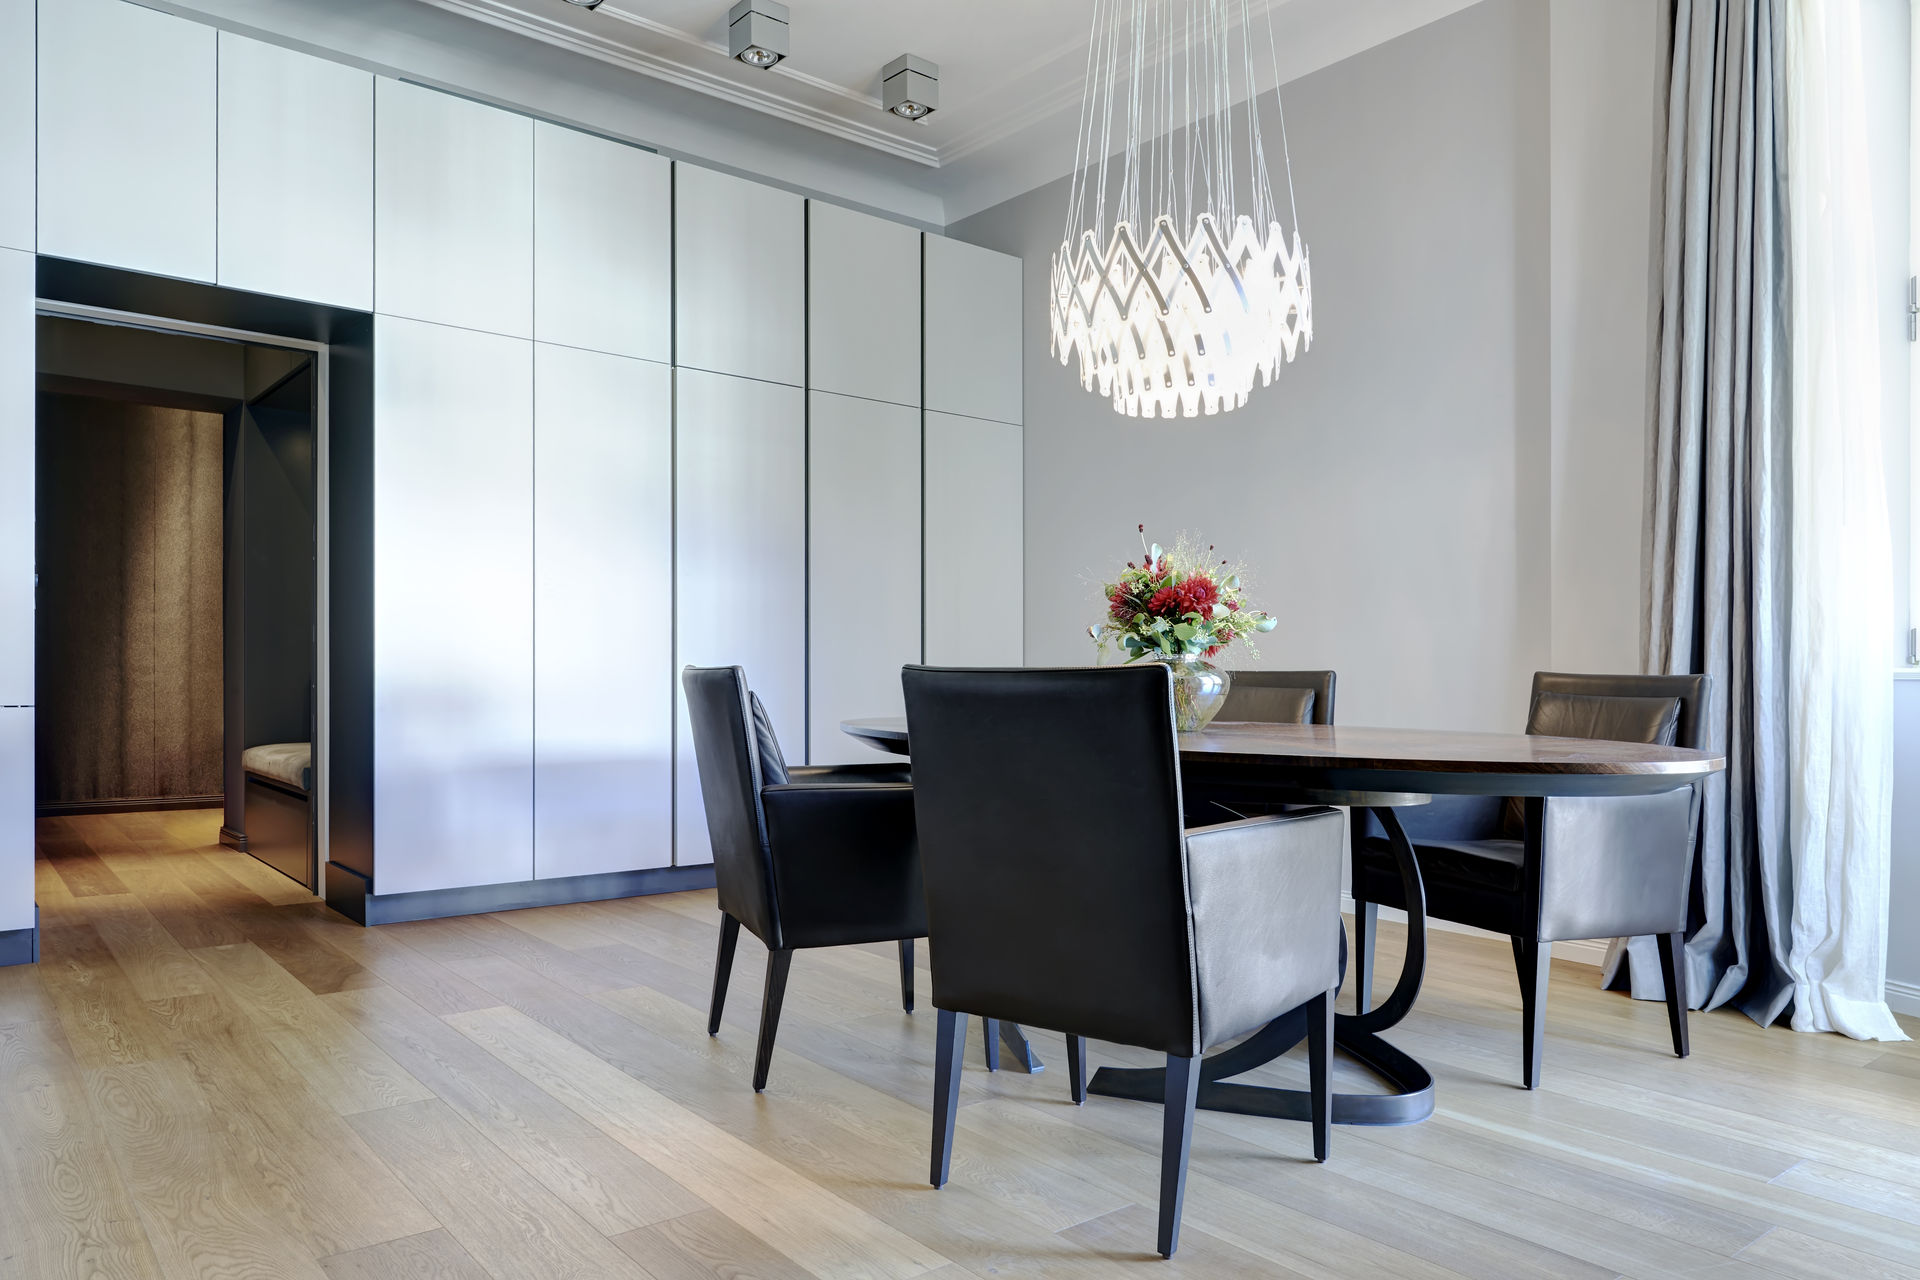 einzigartiges luxus apartment im haus cumberland farawayhome. Black Bedroom Furniture Sets. Home Design Ideas